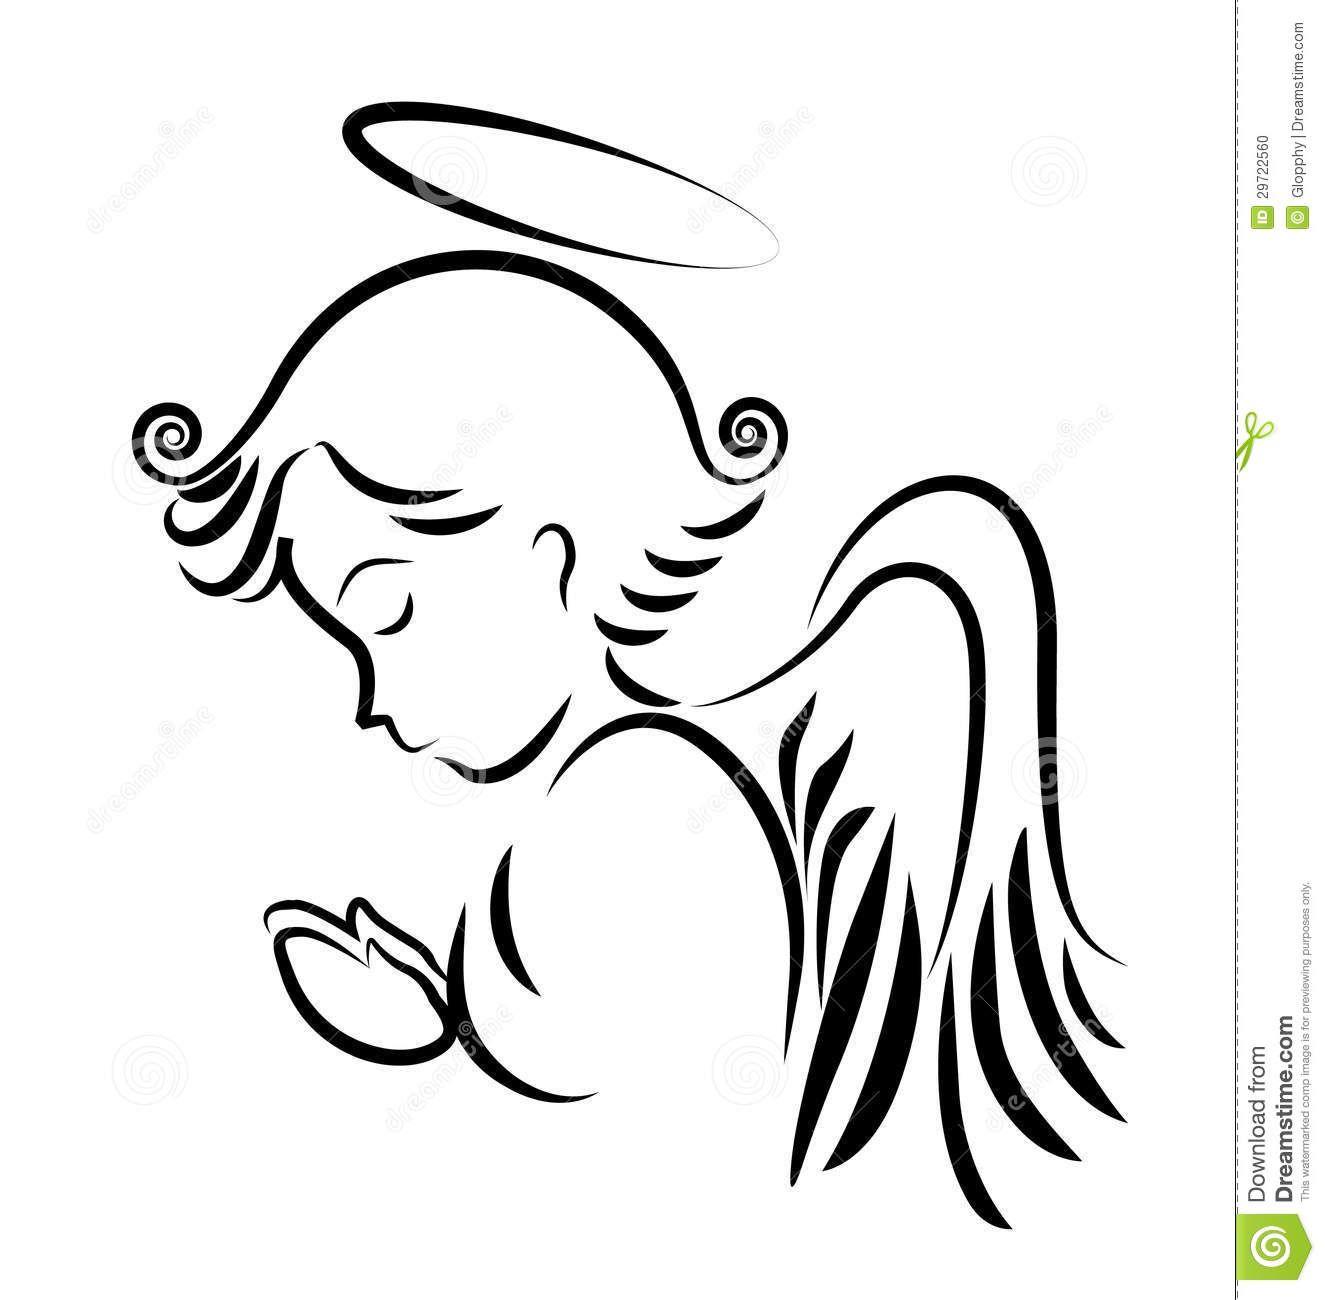 Silueta De Angel